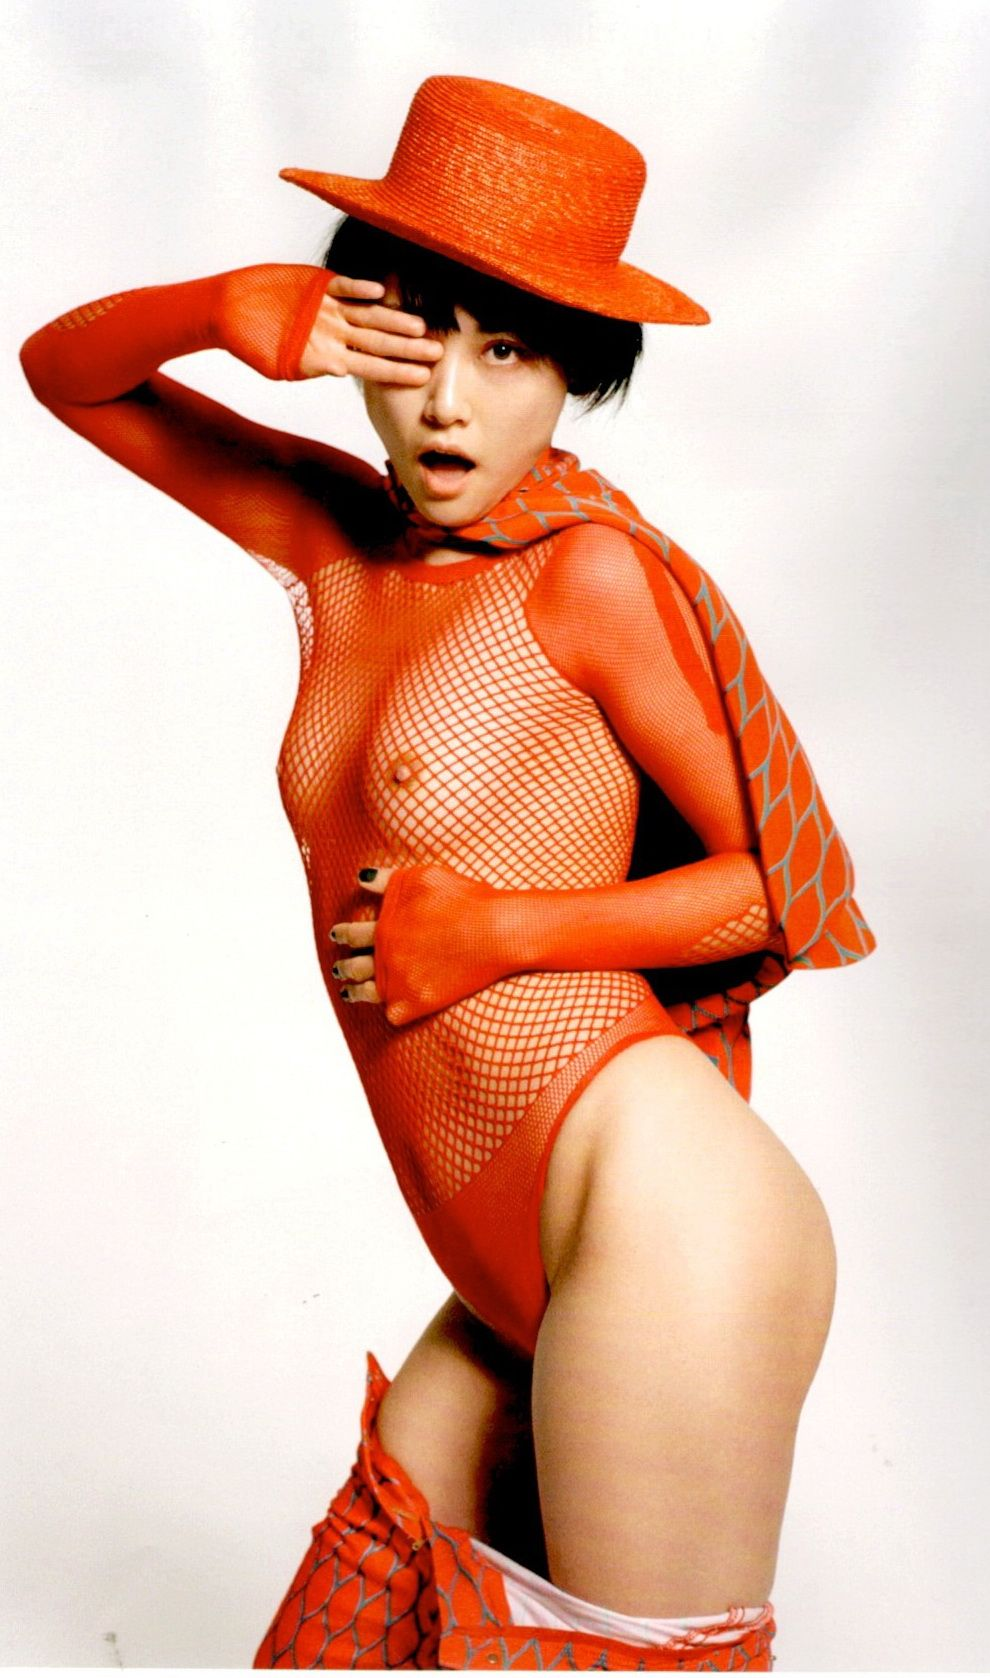 Rinko Kikuchi Artistic But Nude Figures In 2019 Rinko Kikuchi